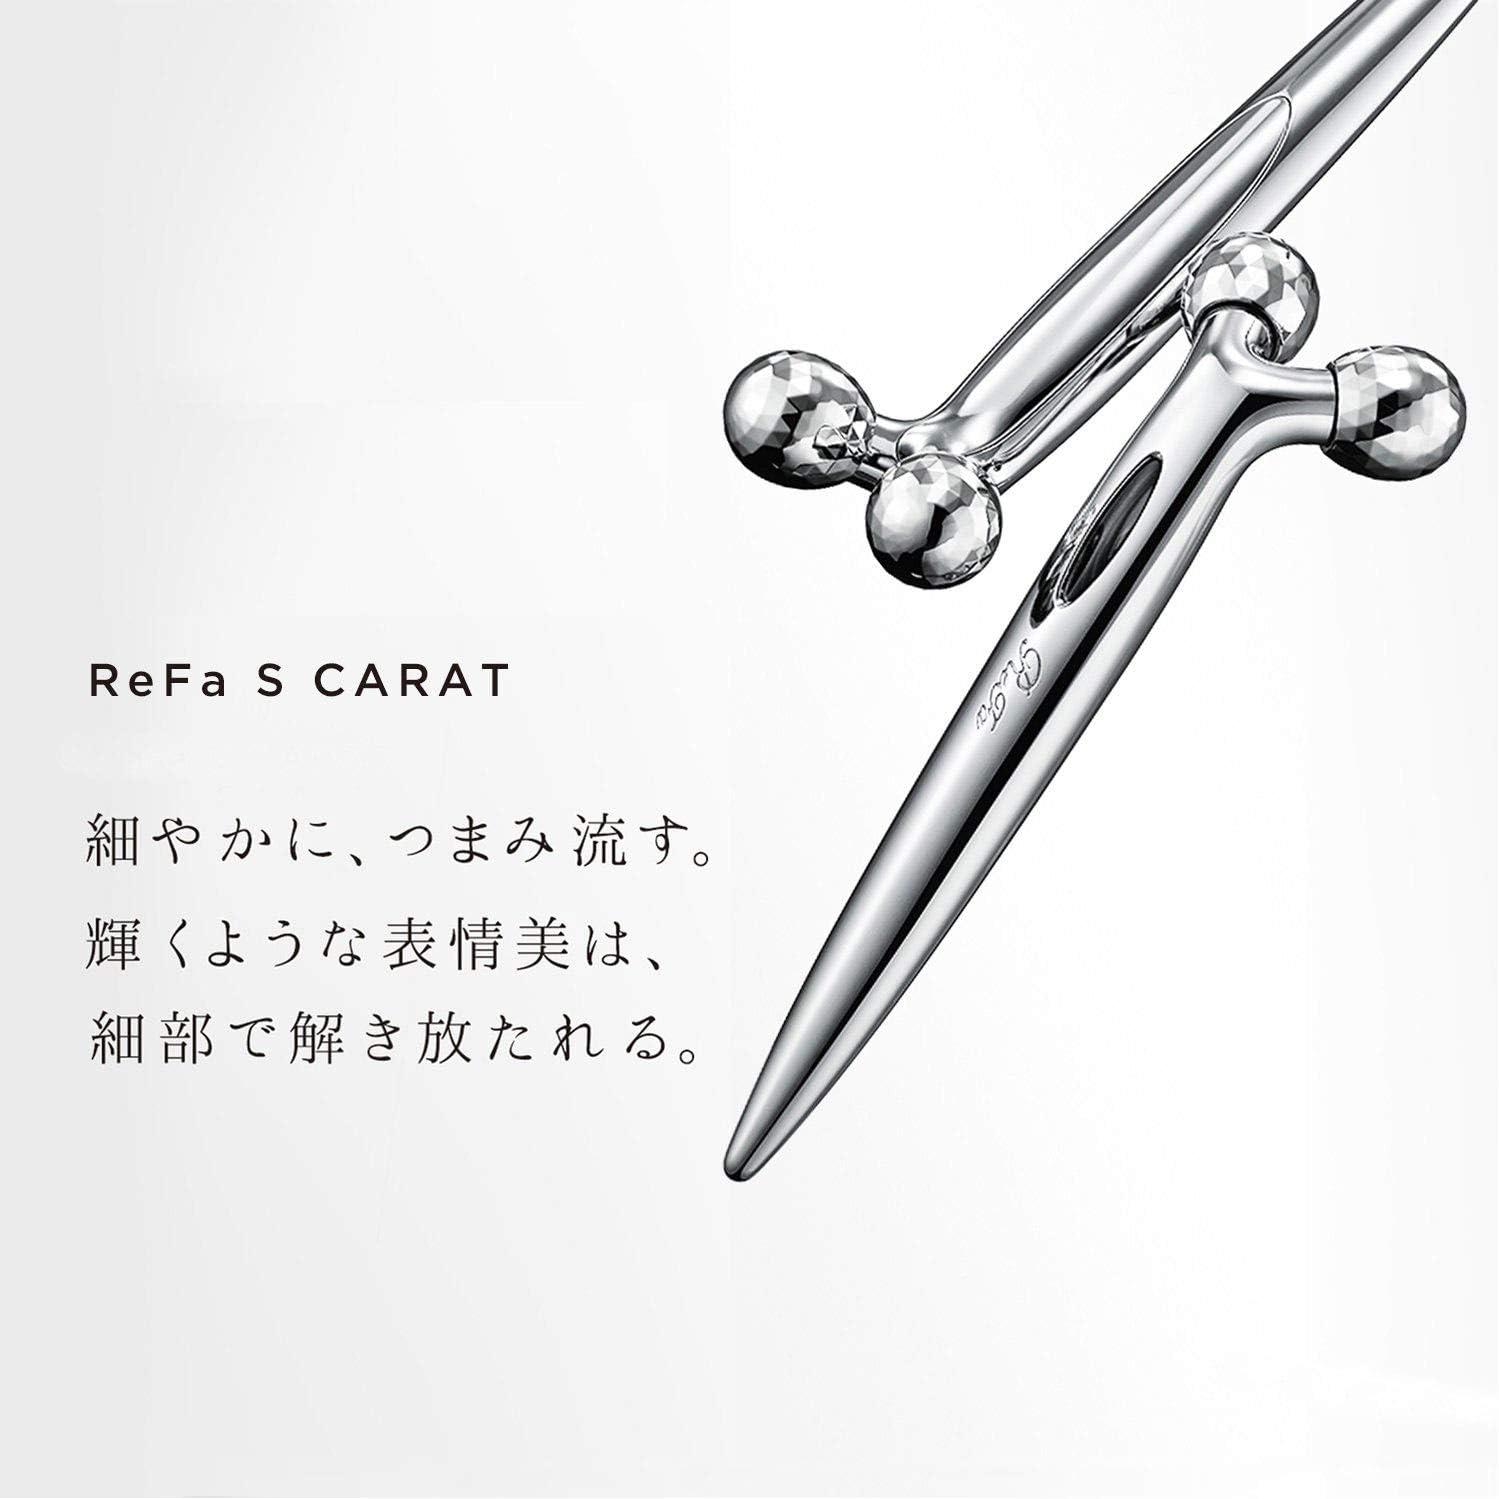 MTG ReFa S CARAT (リファエスカラット)フェイス用